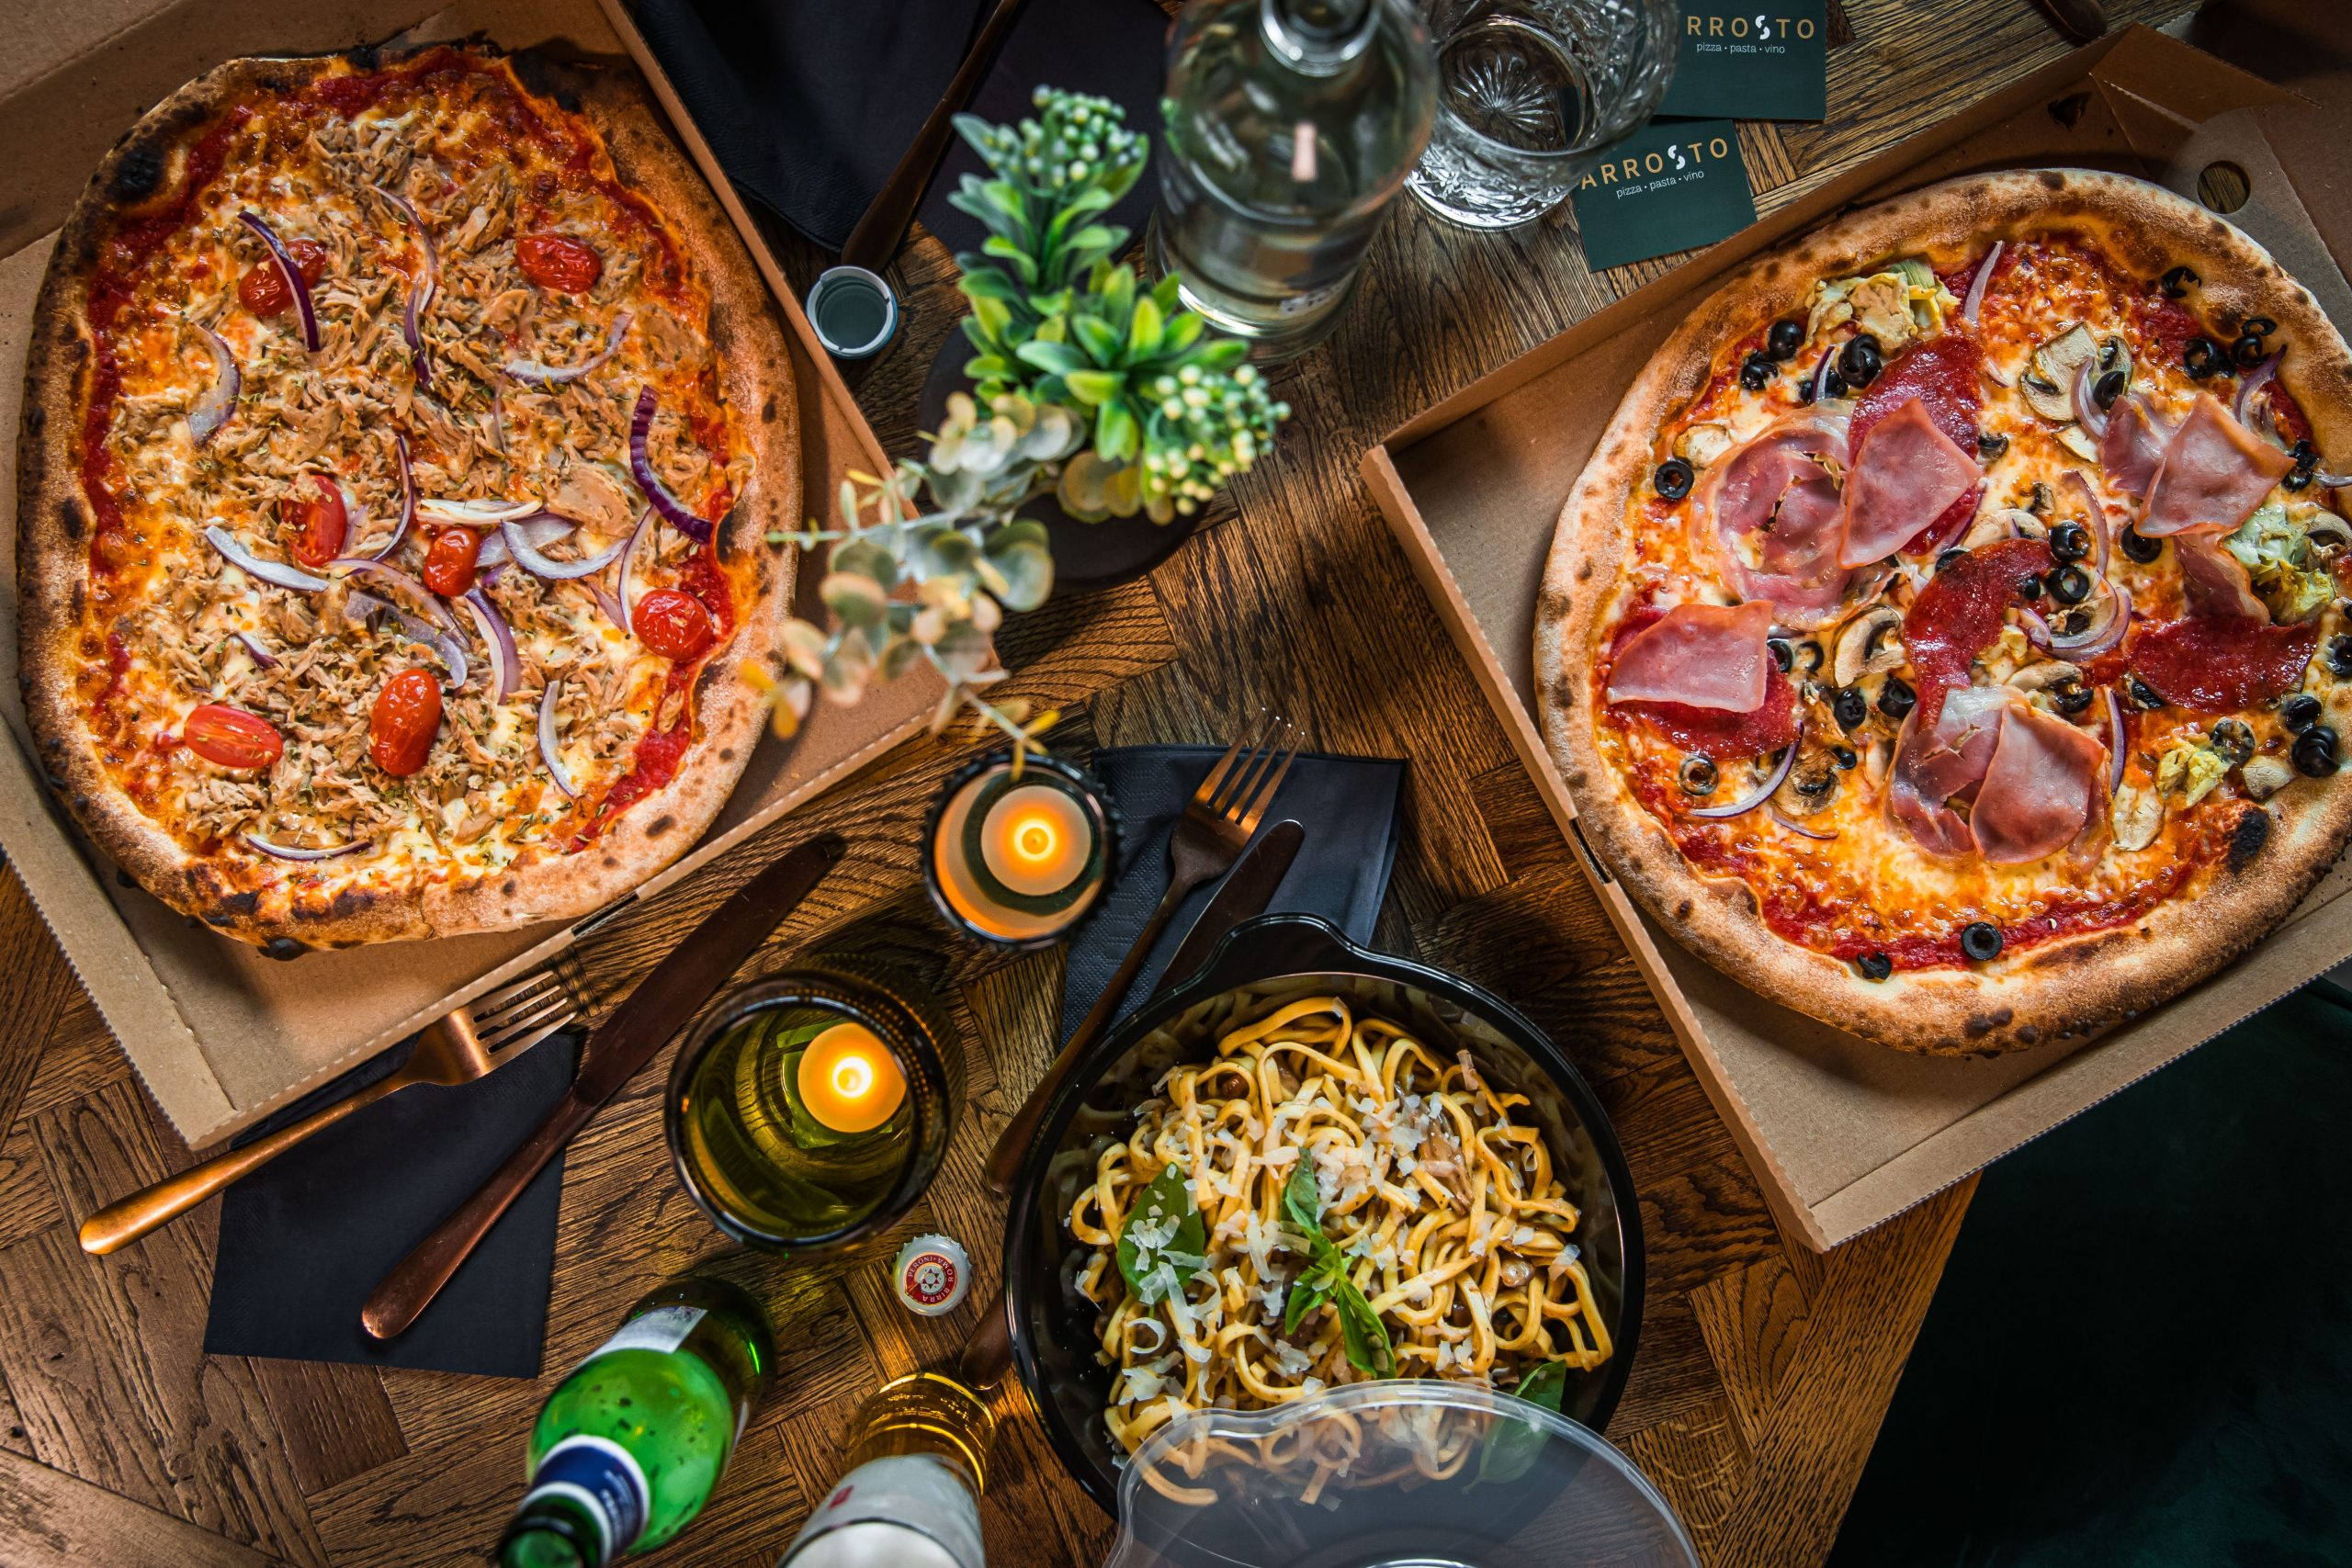 Afhalen bezorgen Italiaans pizza pasta thuisbezorg